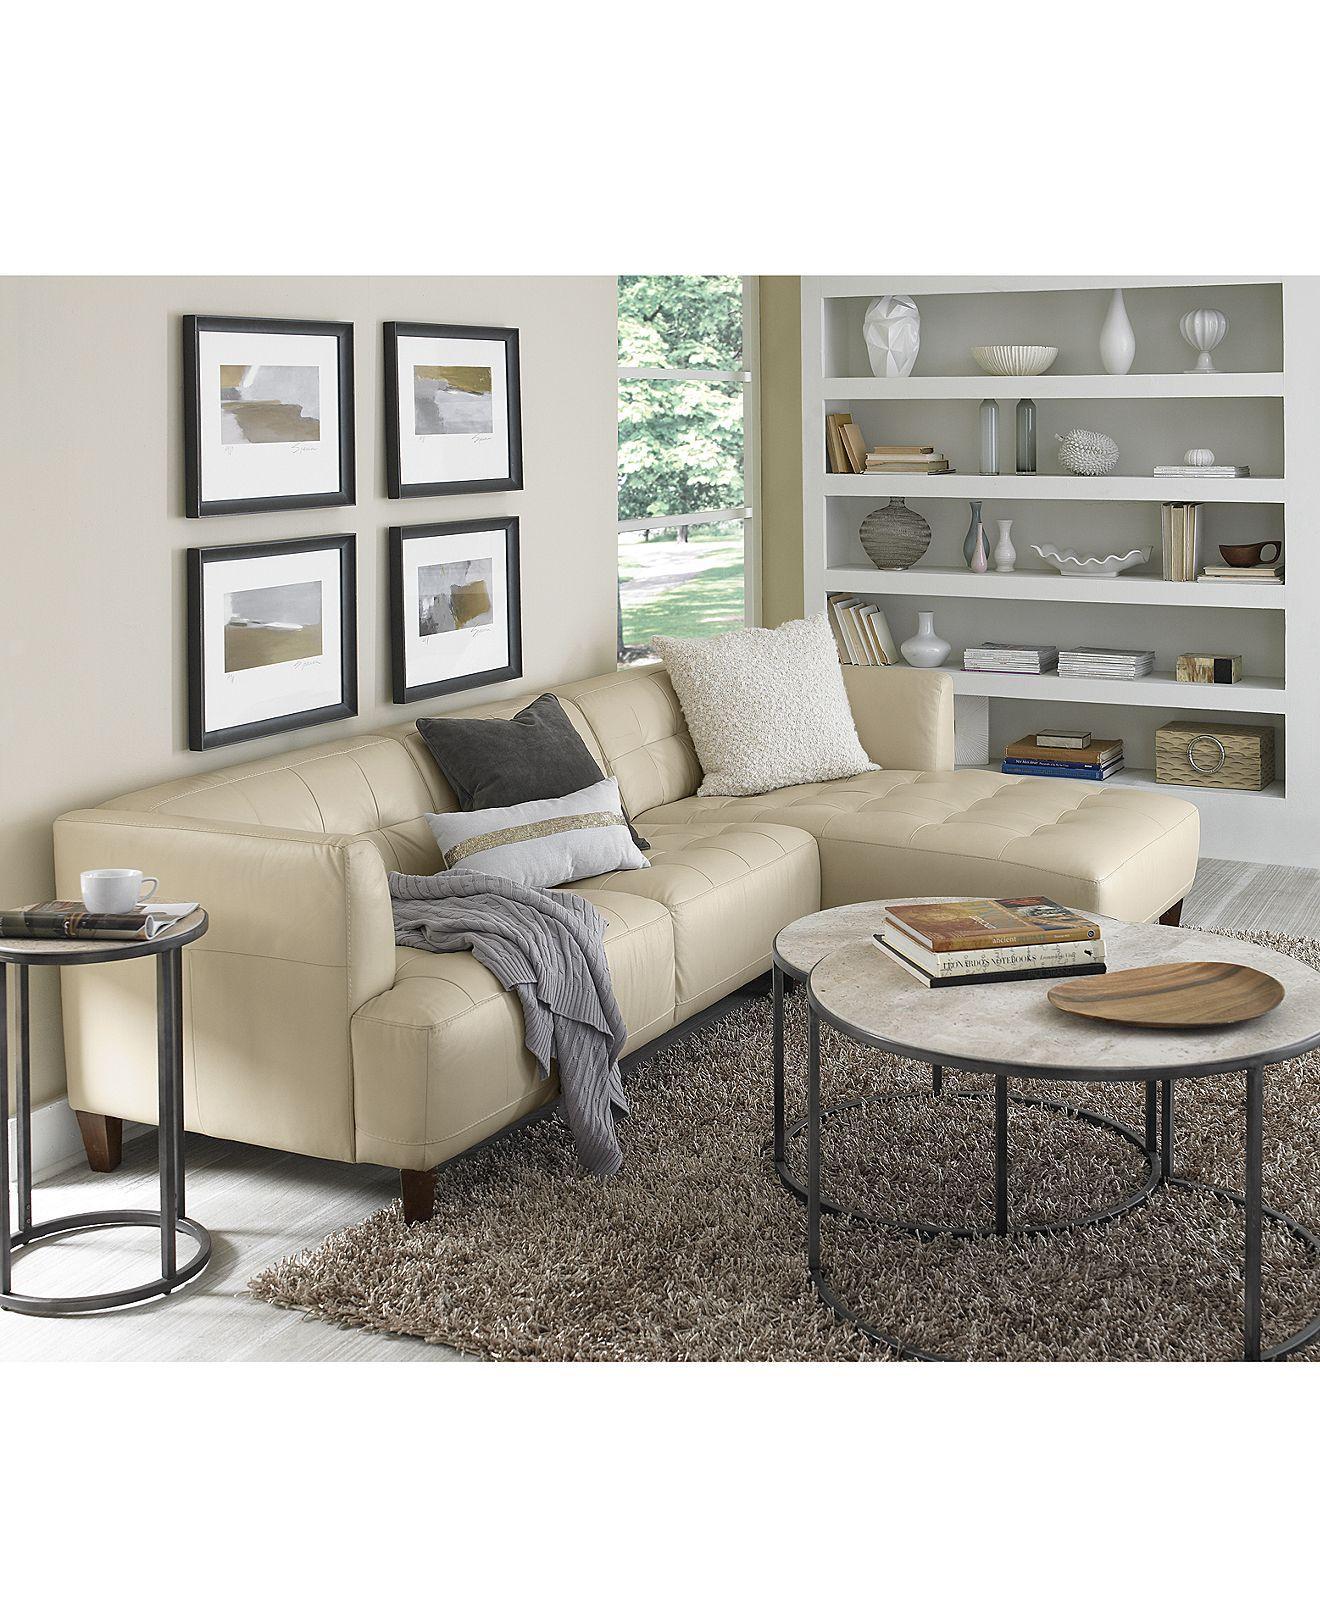 20++ Macys living room furniture sets ideas in 2021